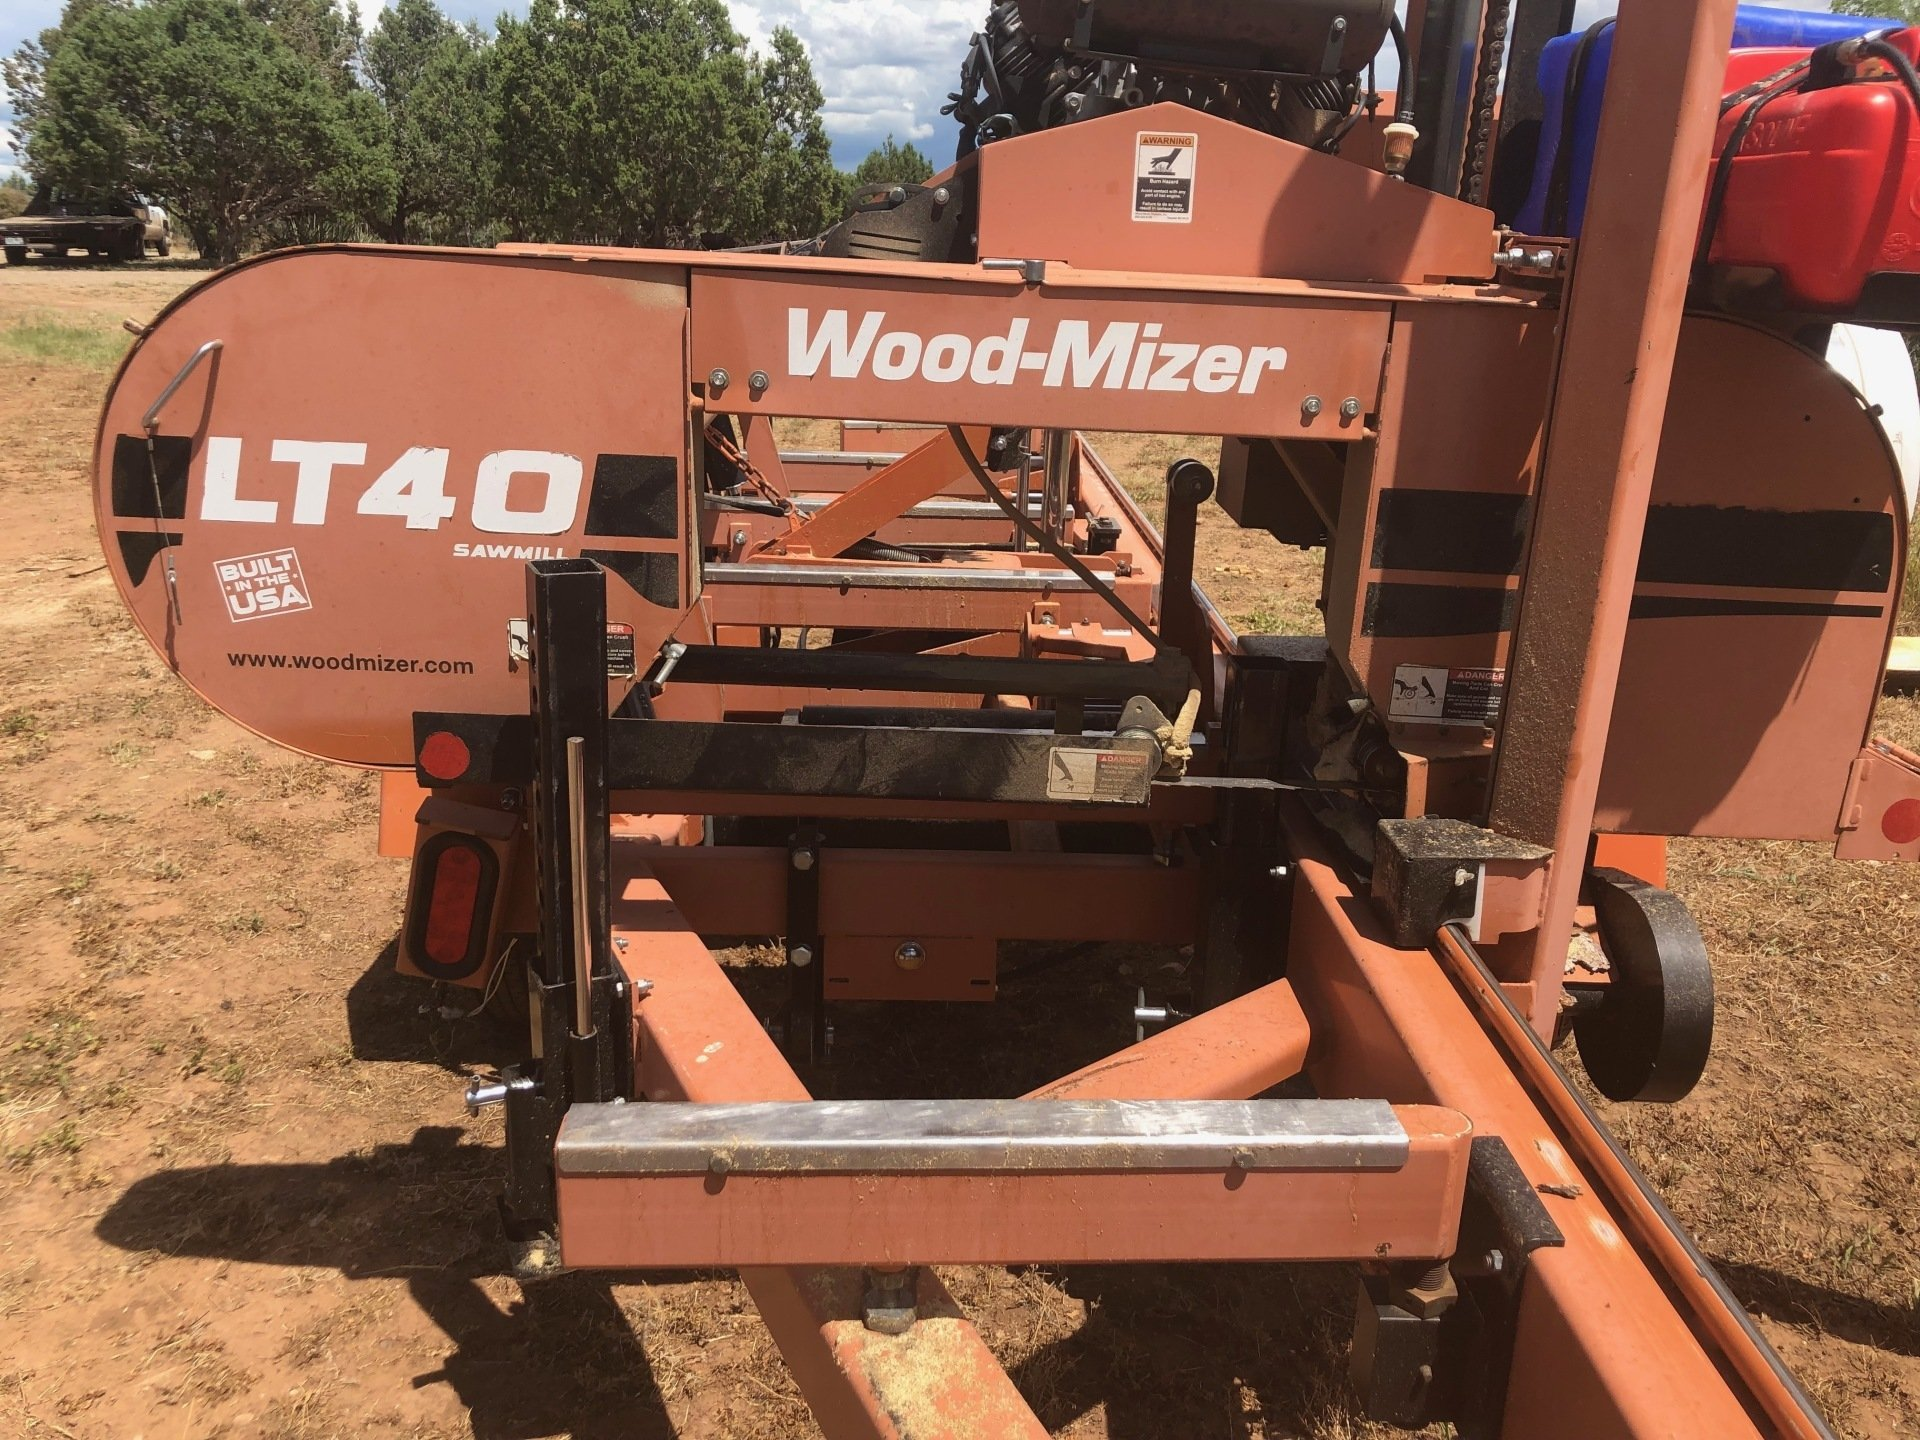 Used Sawmills For Sale | usedsawmills com